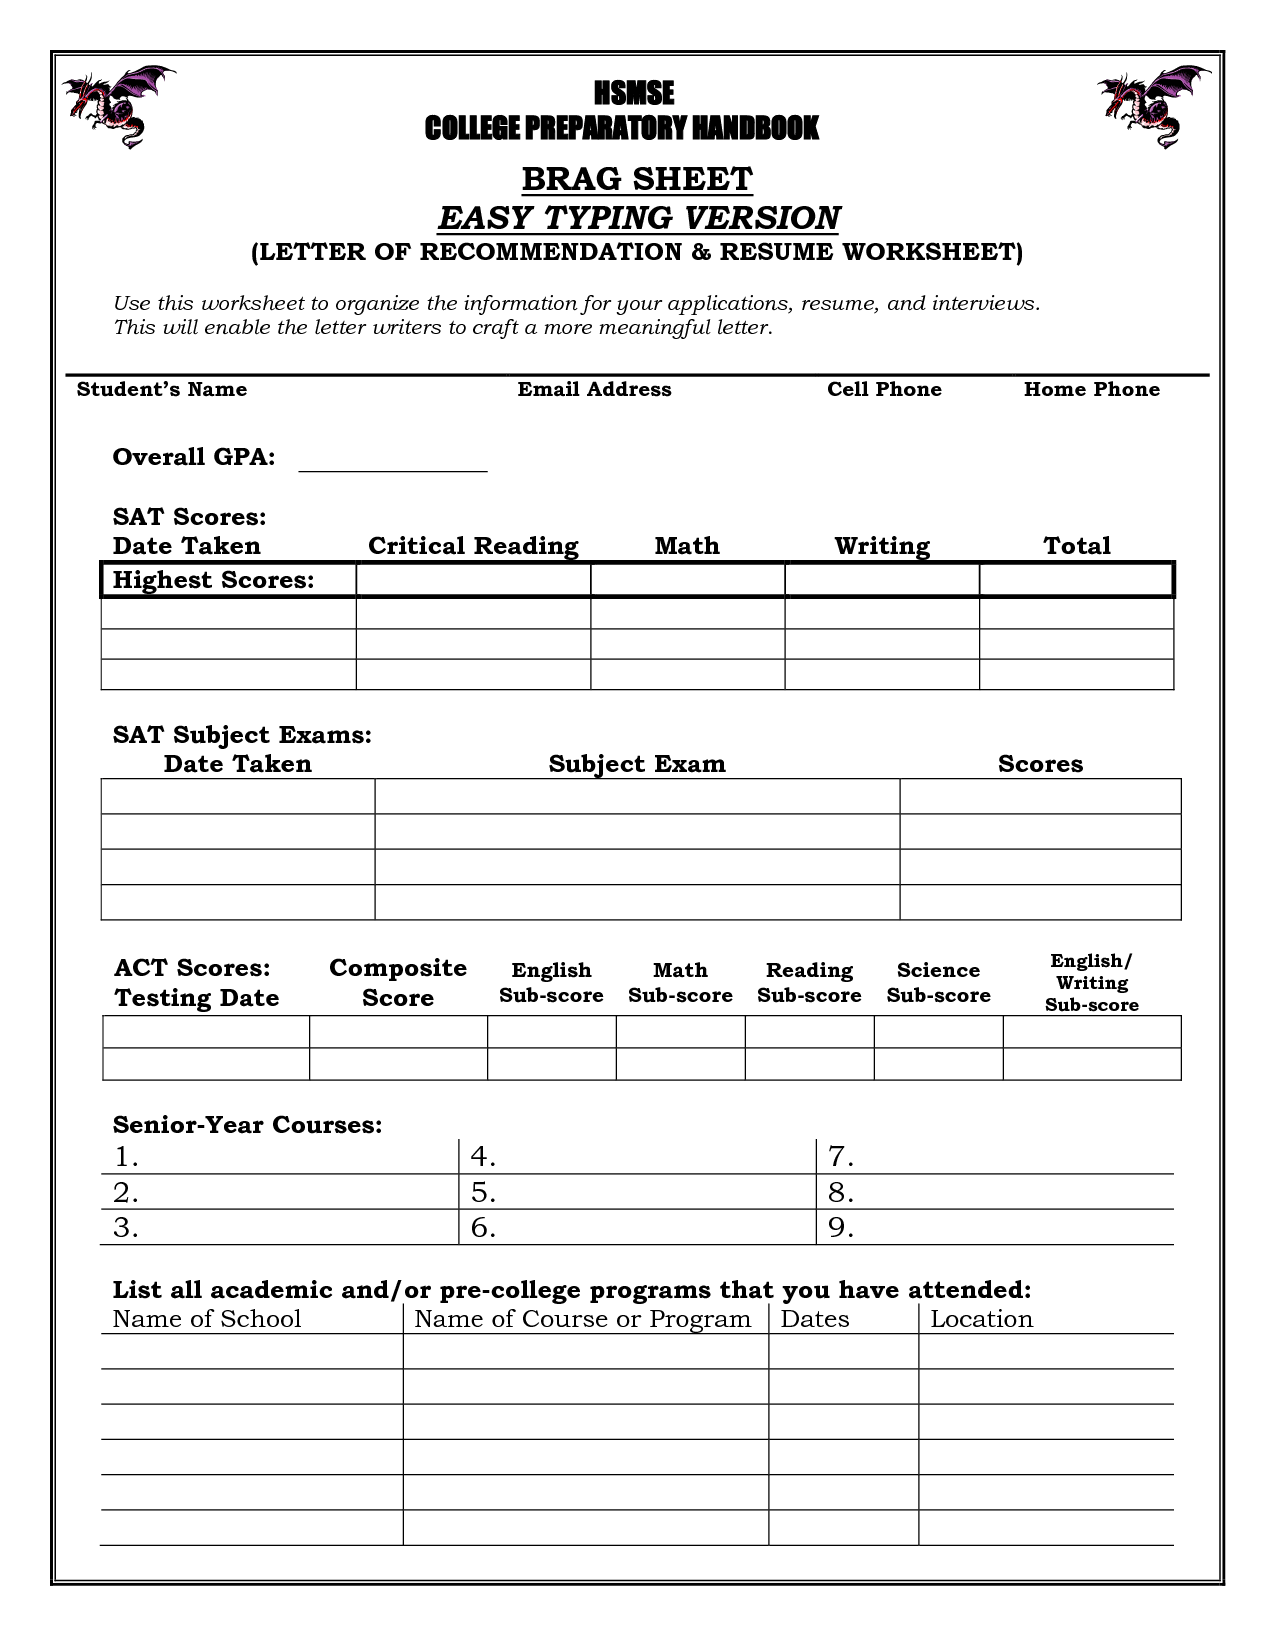 resume building sheet online resume builder resume building sheet resume building worksheet career center sheet template resume template worksheet and resume building